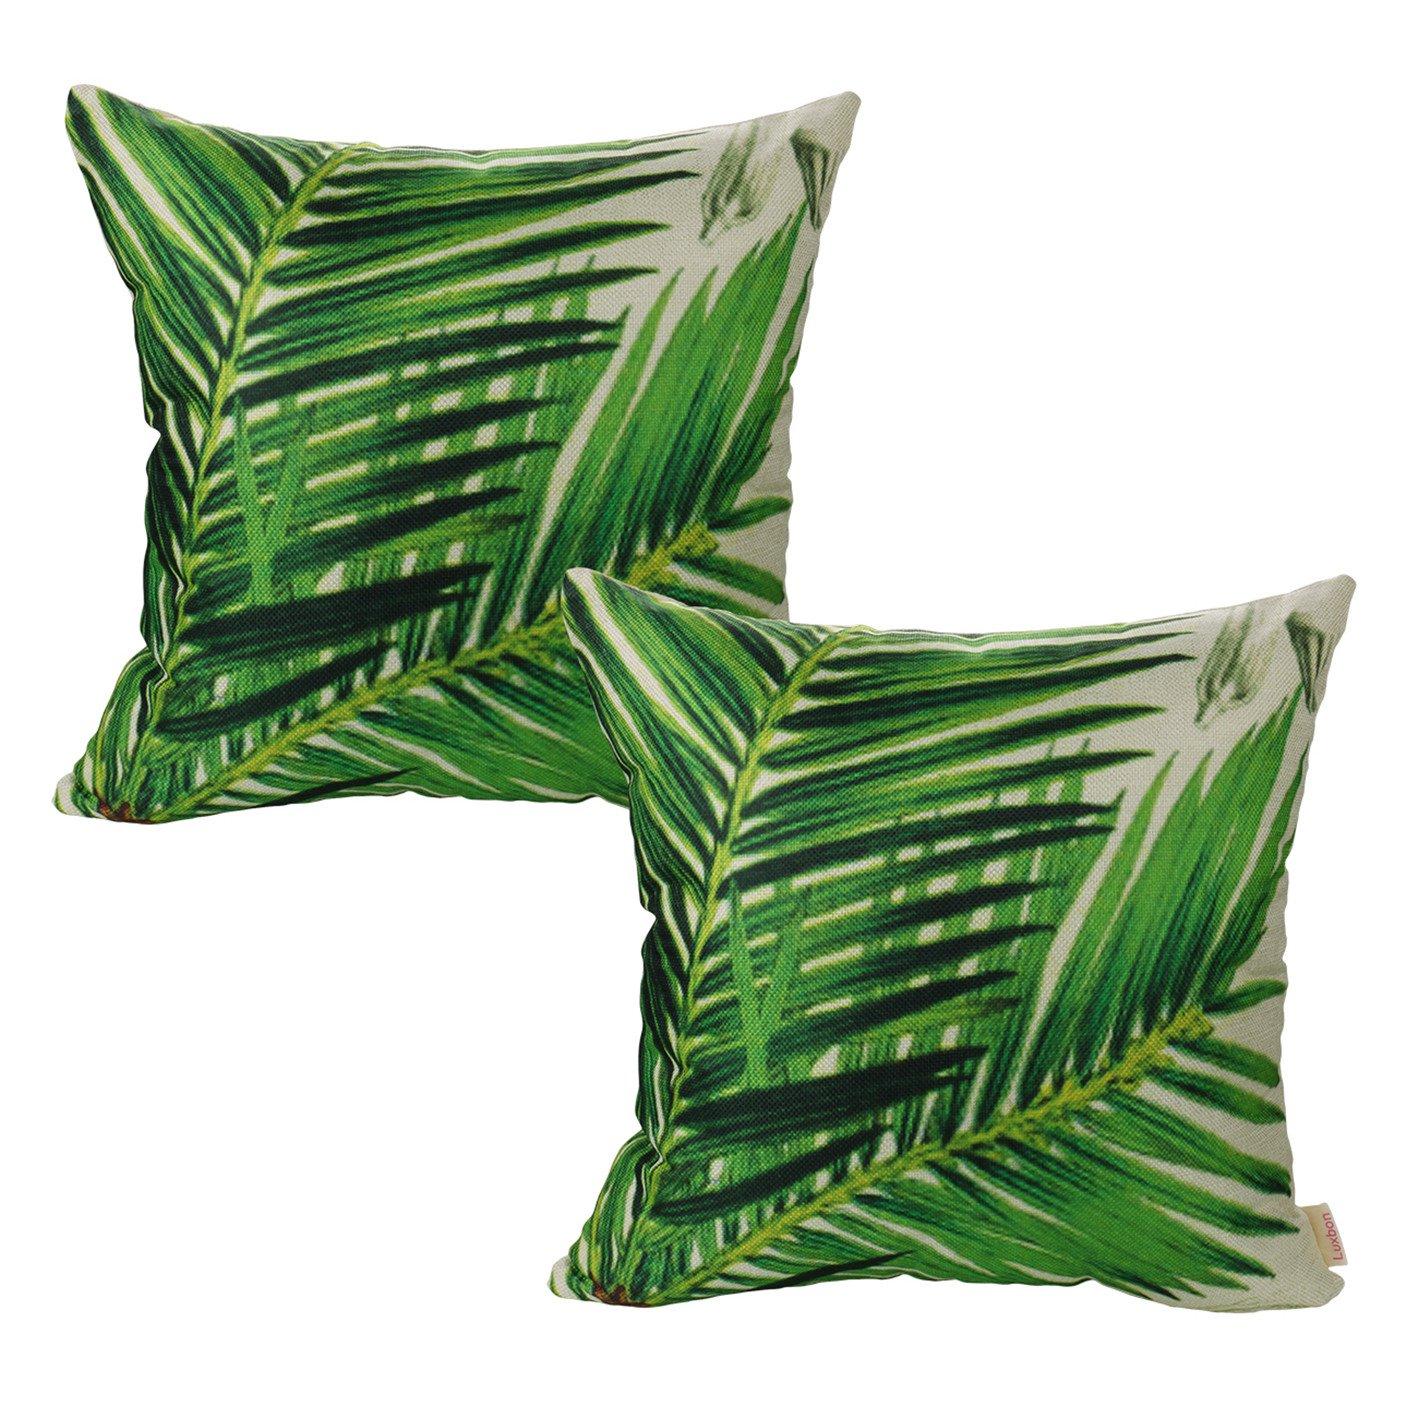 Luxbon 2Pcs Funda Cojines 45x45 Sofá Verde Lino Duradero Fundas de Almohada de Panda Planta Hojas Bambú Primavera para Coche Cama Hogar Decoracion